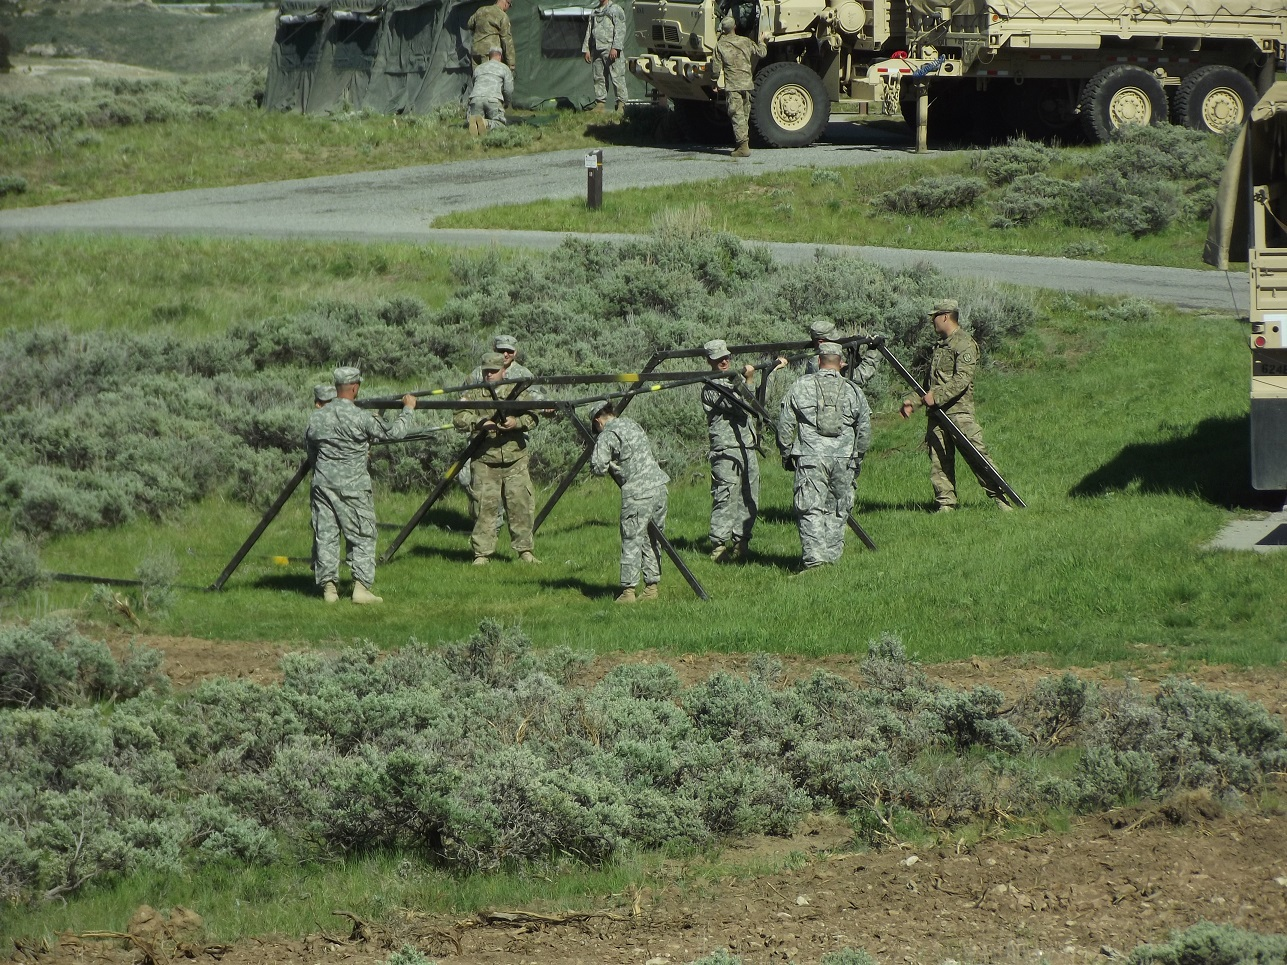 ArmyNG-SoldierCreek-5-sm.jpg